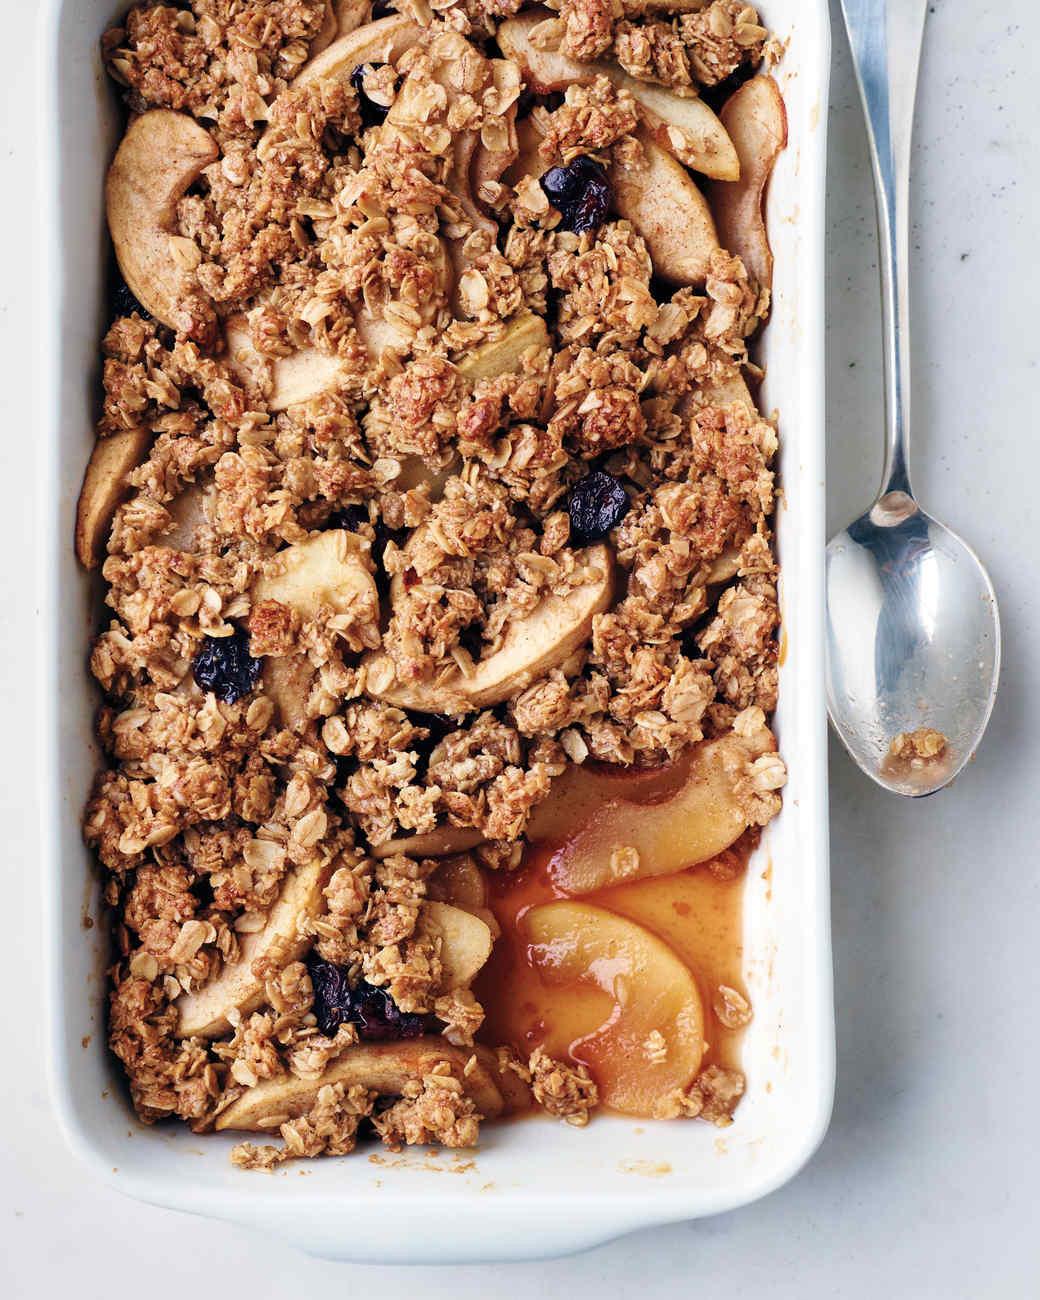 Oatmeal Dessert Recipes  Apple Oat Crisp Recipe & Video